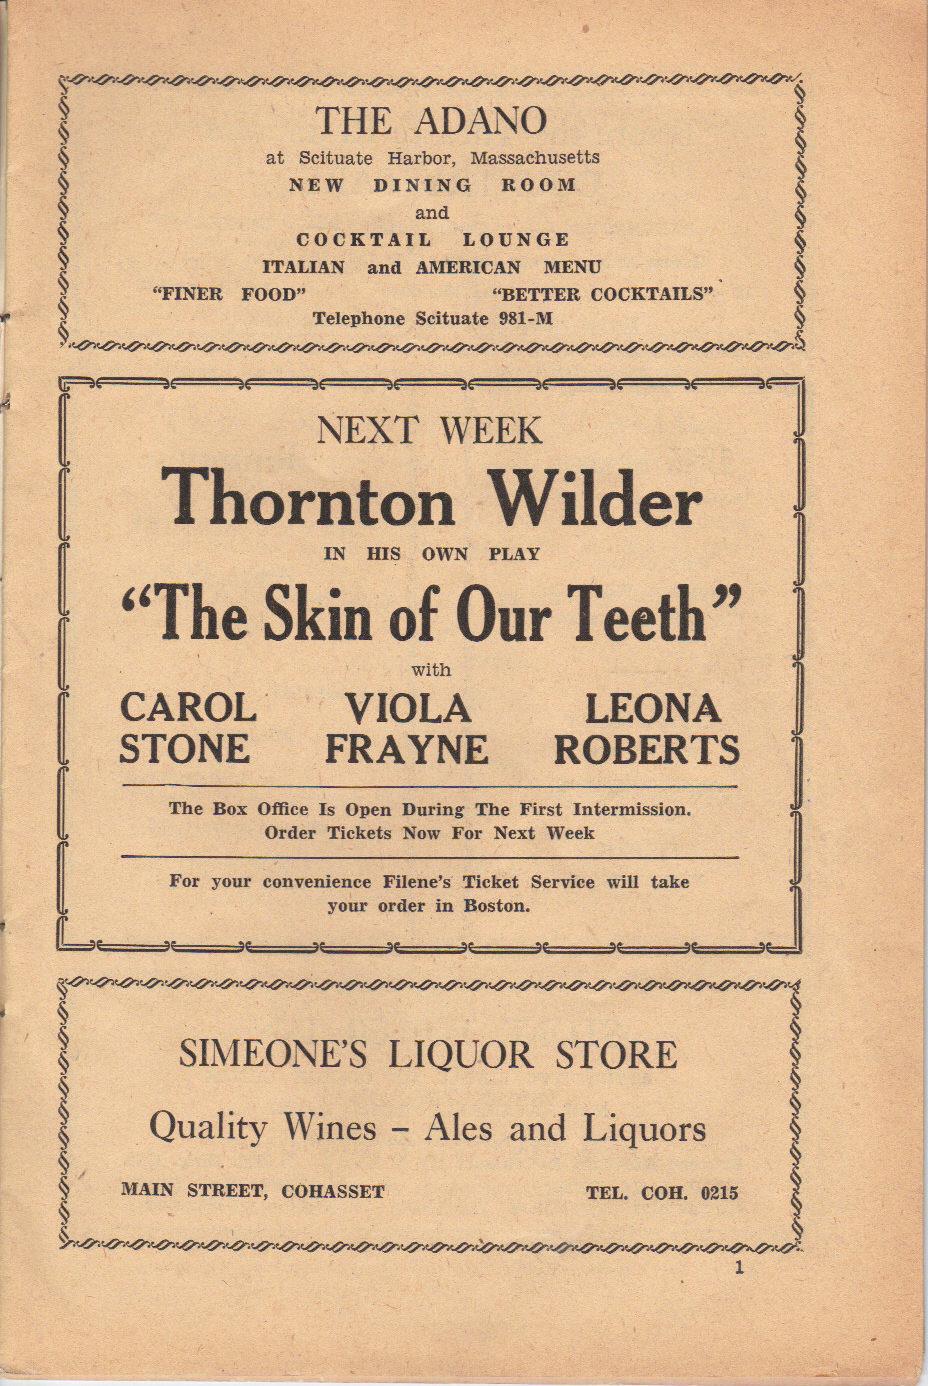 wilder-in-the-skin-of-our-teeth_4307067340_o.jpg